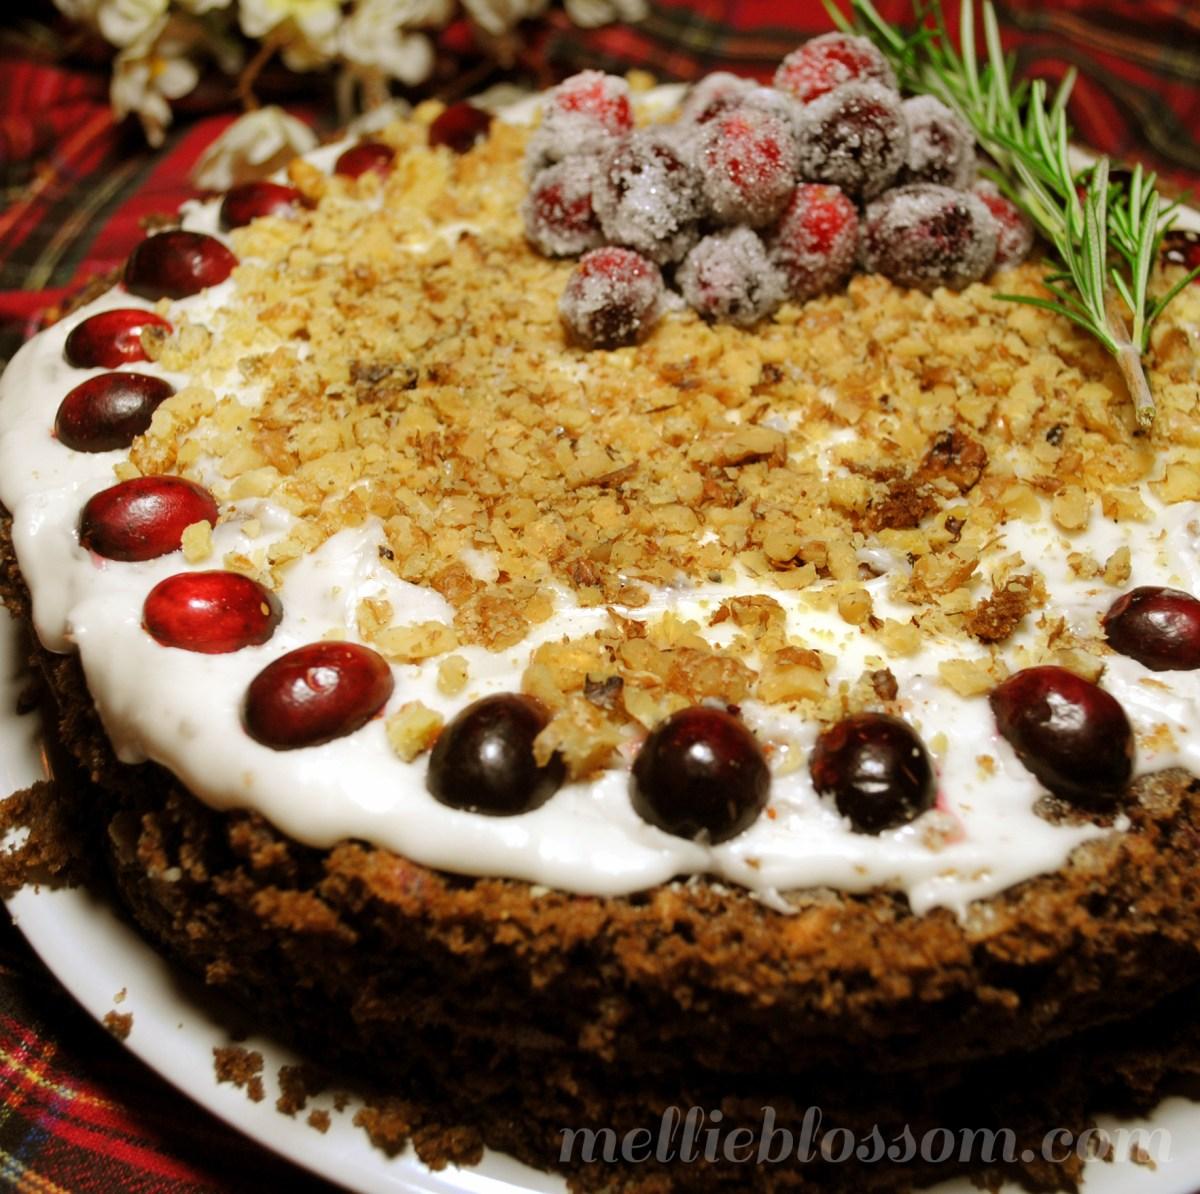 Cranberry Chocolate Cake